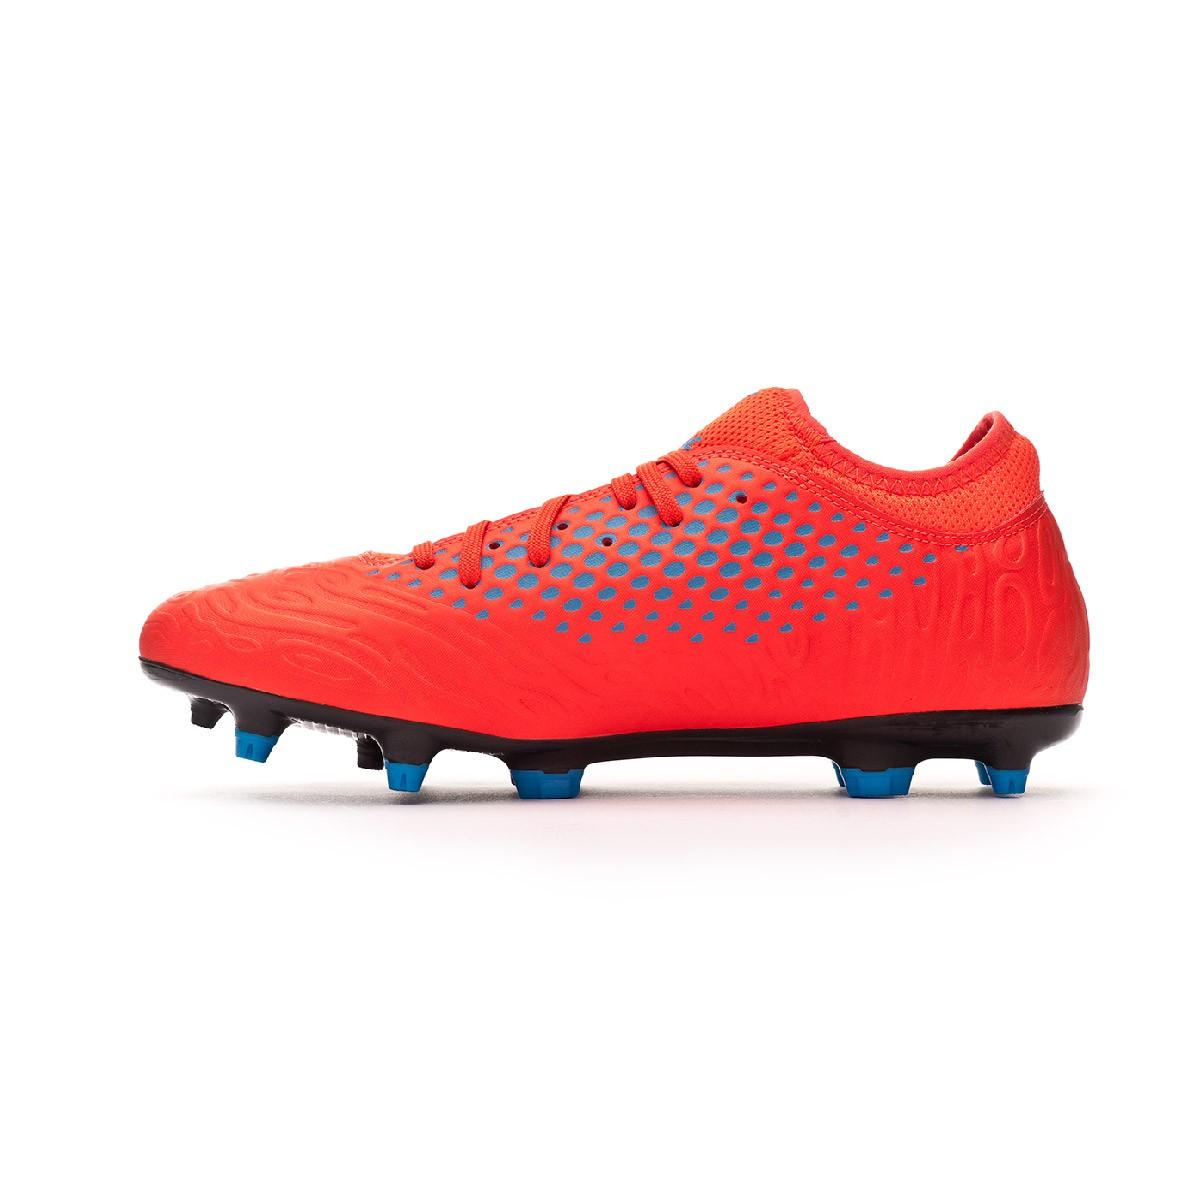 d5525a3a0 Football Boots Puma Future 19.4 FG/AG Red blast-Bleu azur - Football store  Fútbol Emotion